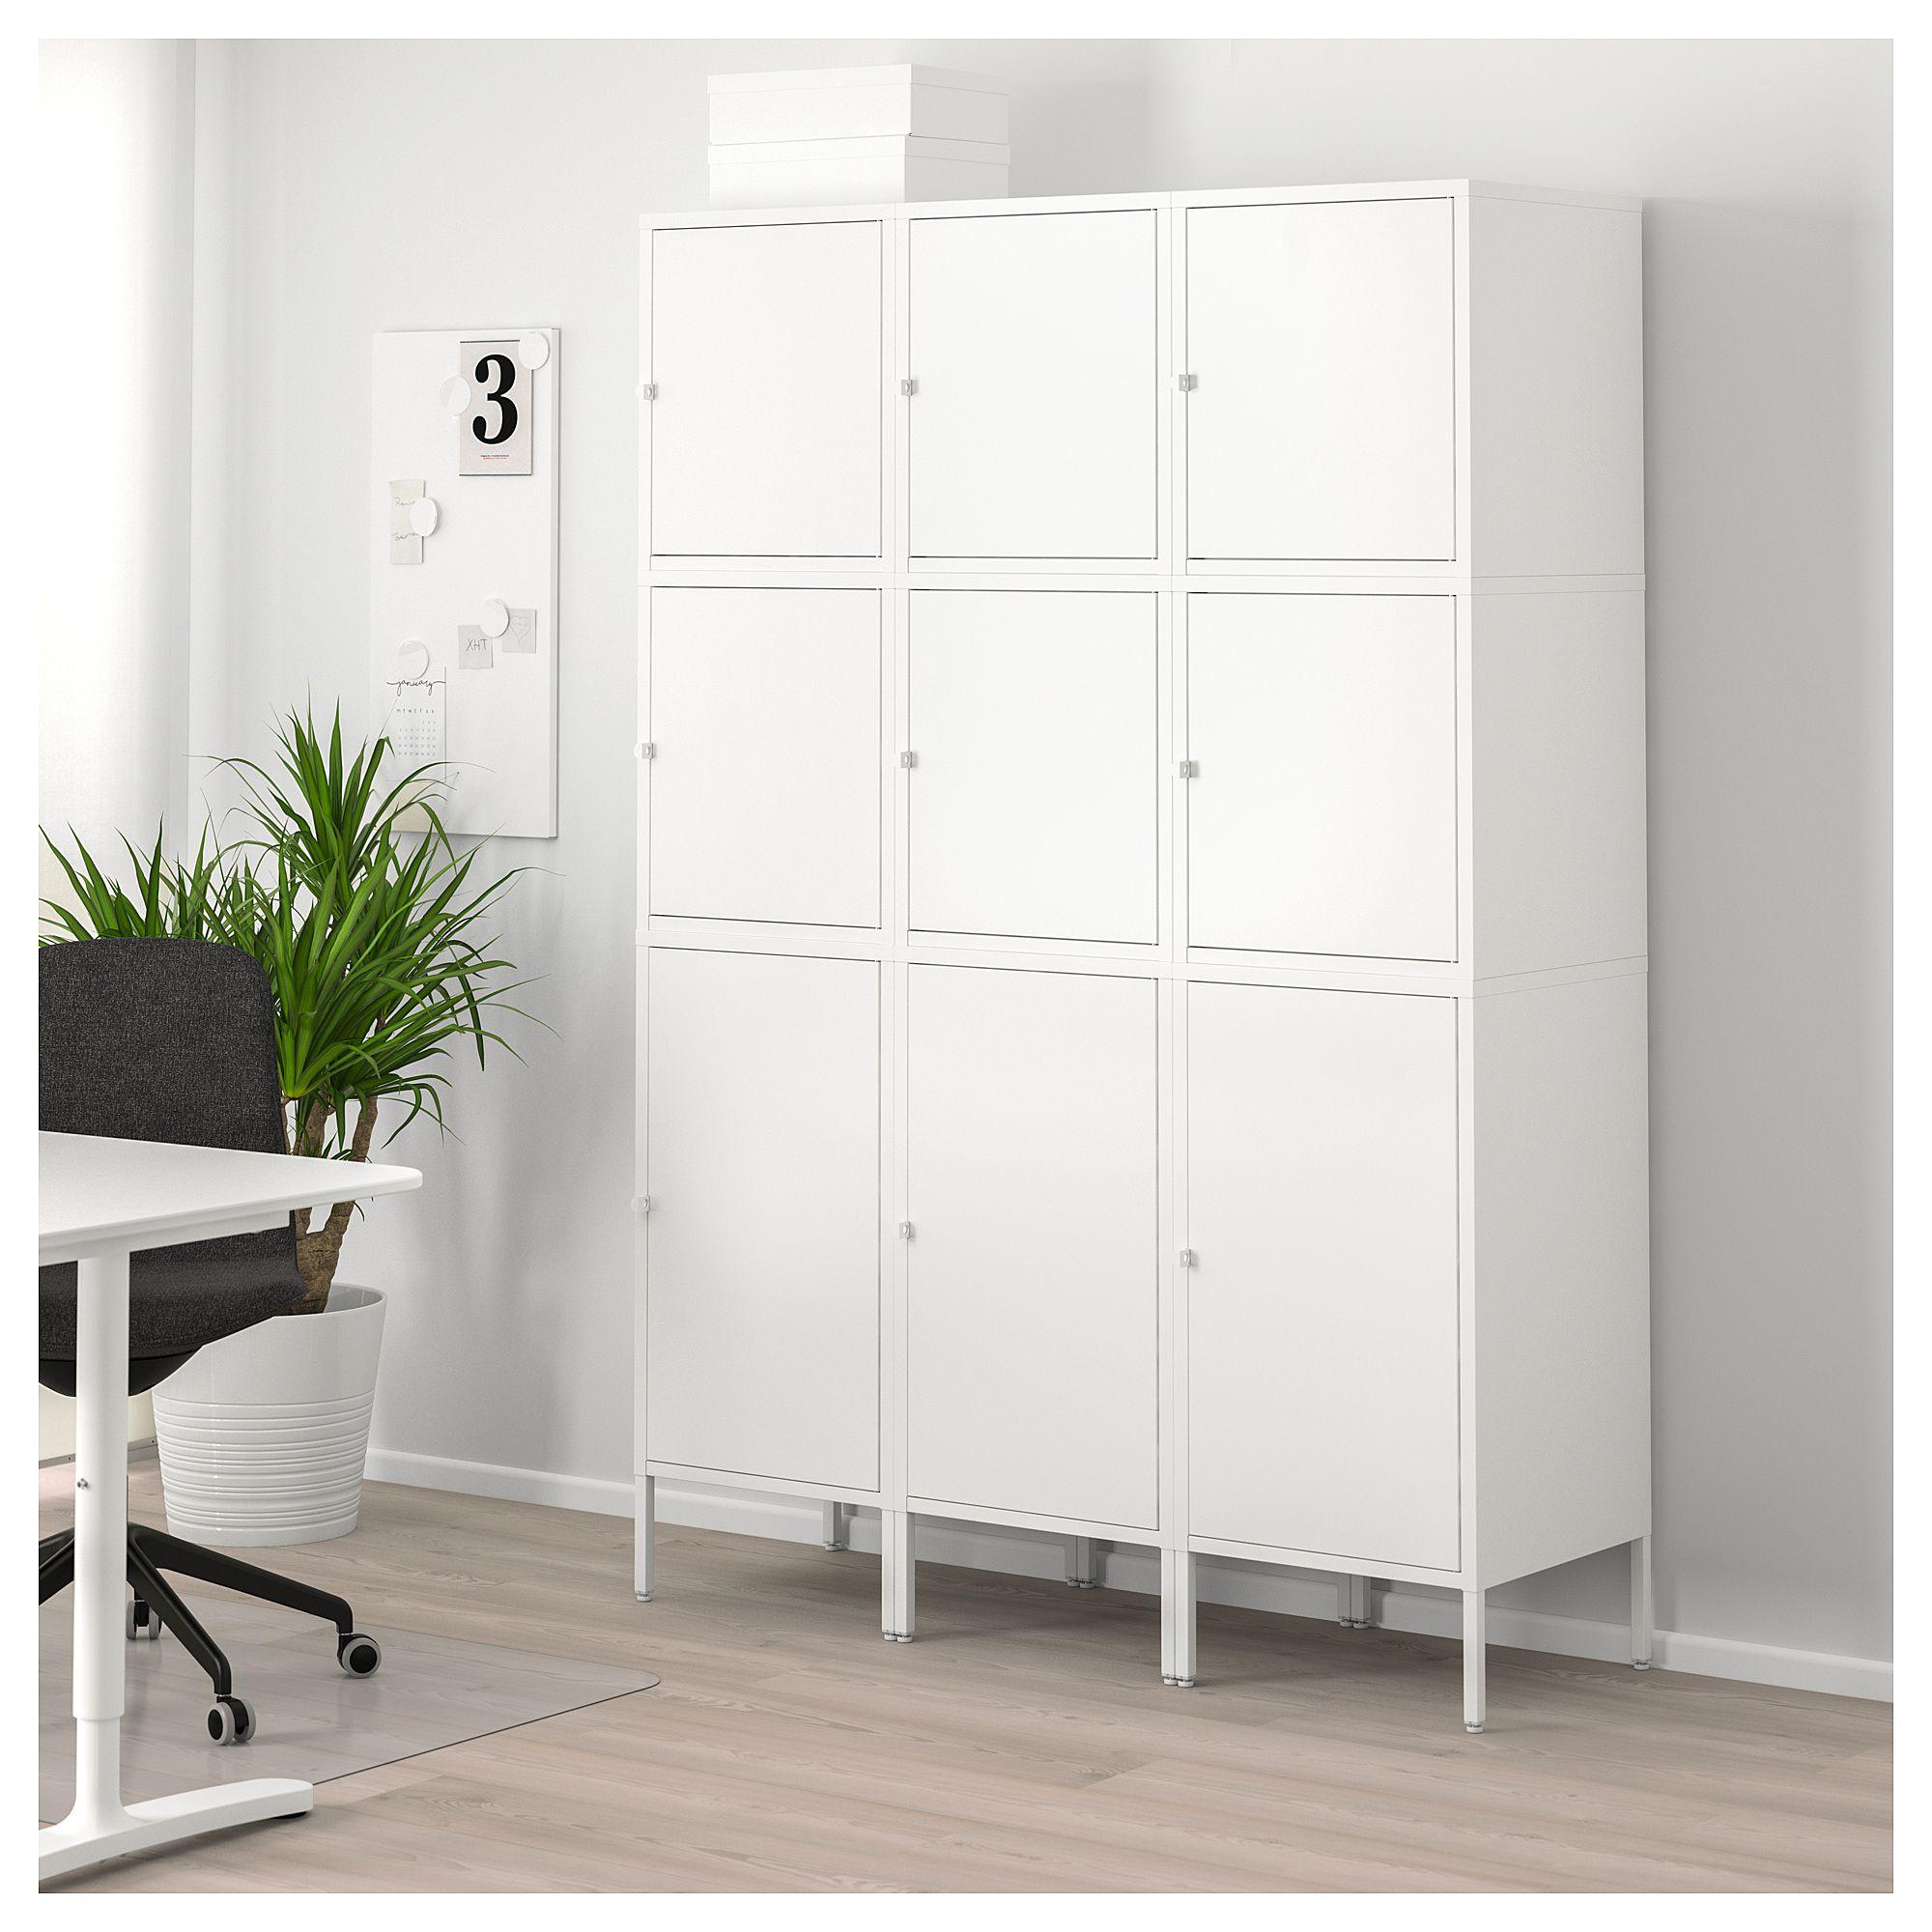 Hällan DoorsWhite En Combination 2019Inspiration Storage With WY9IED2H